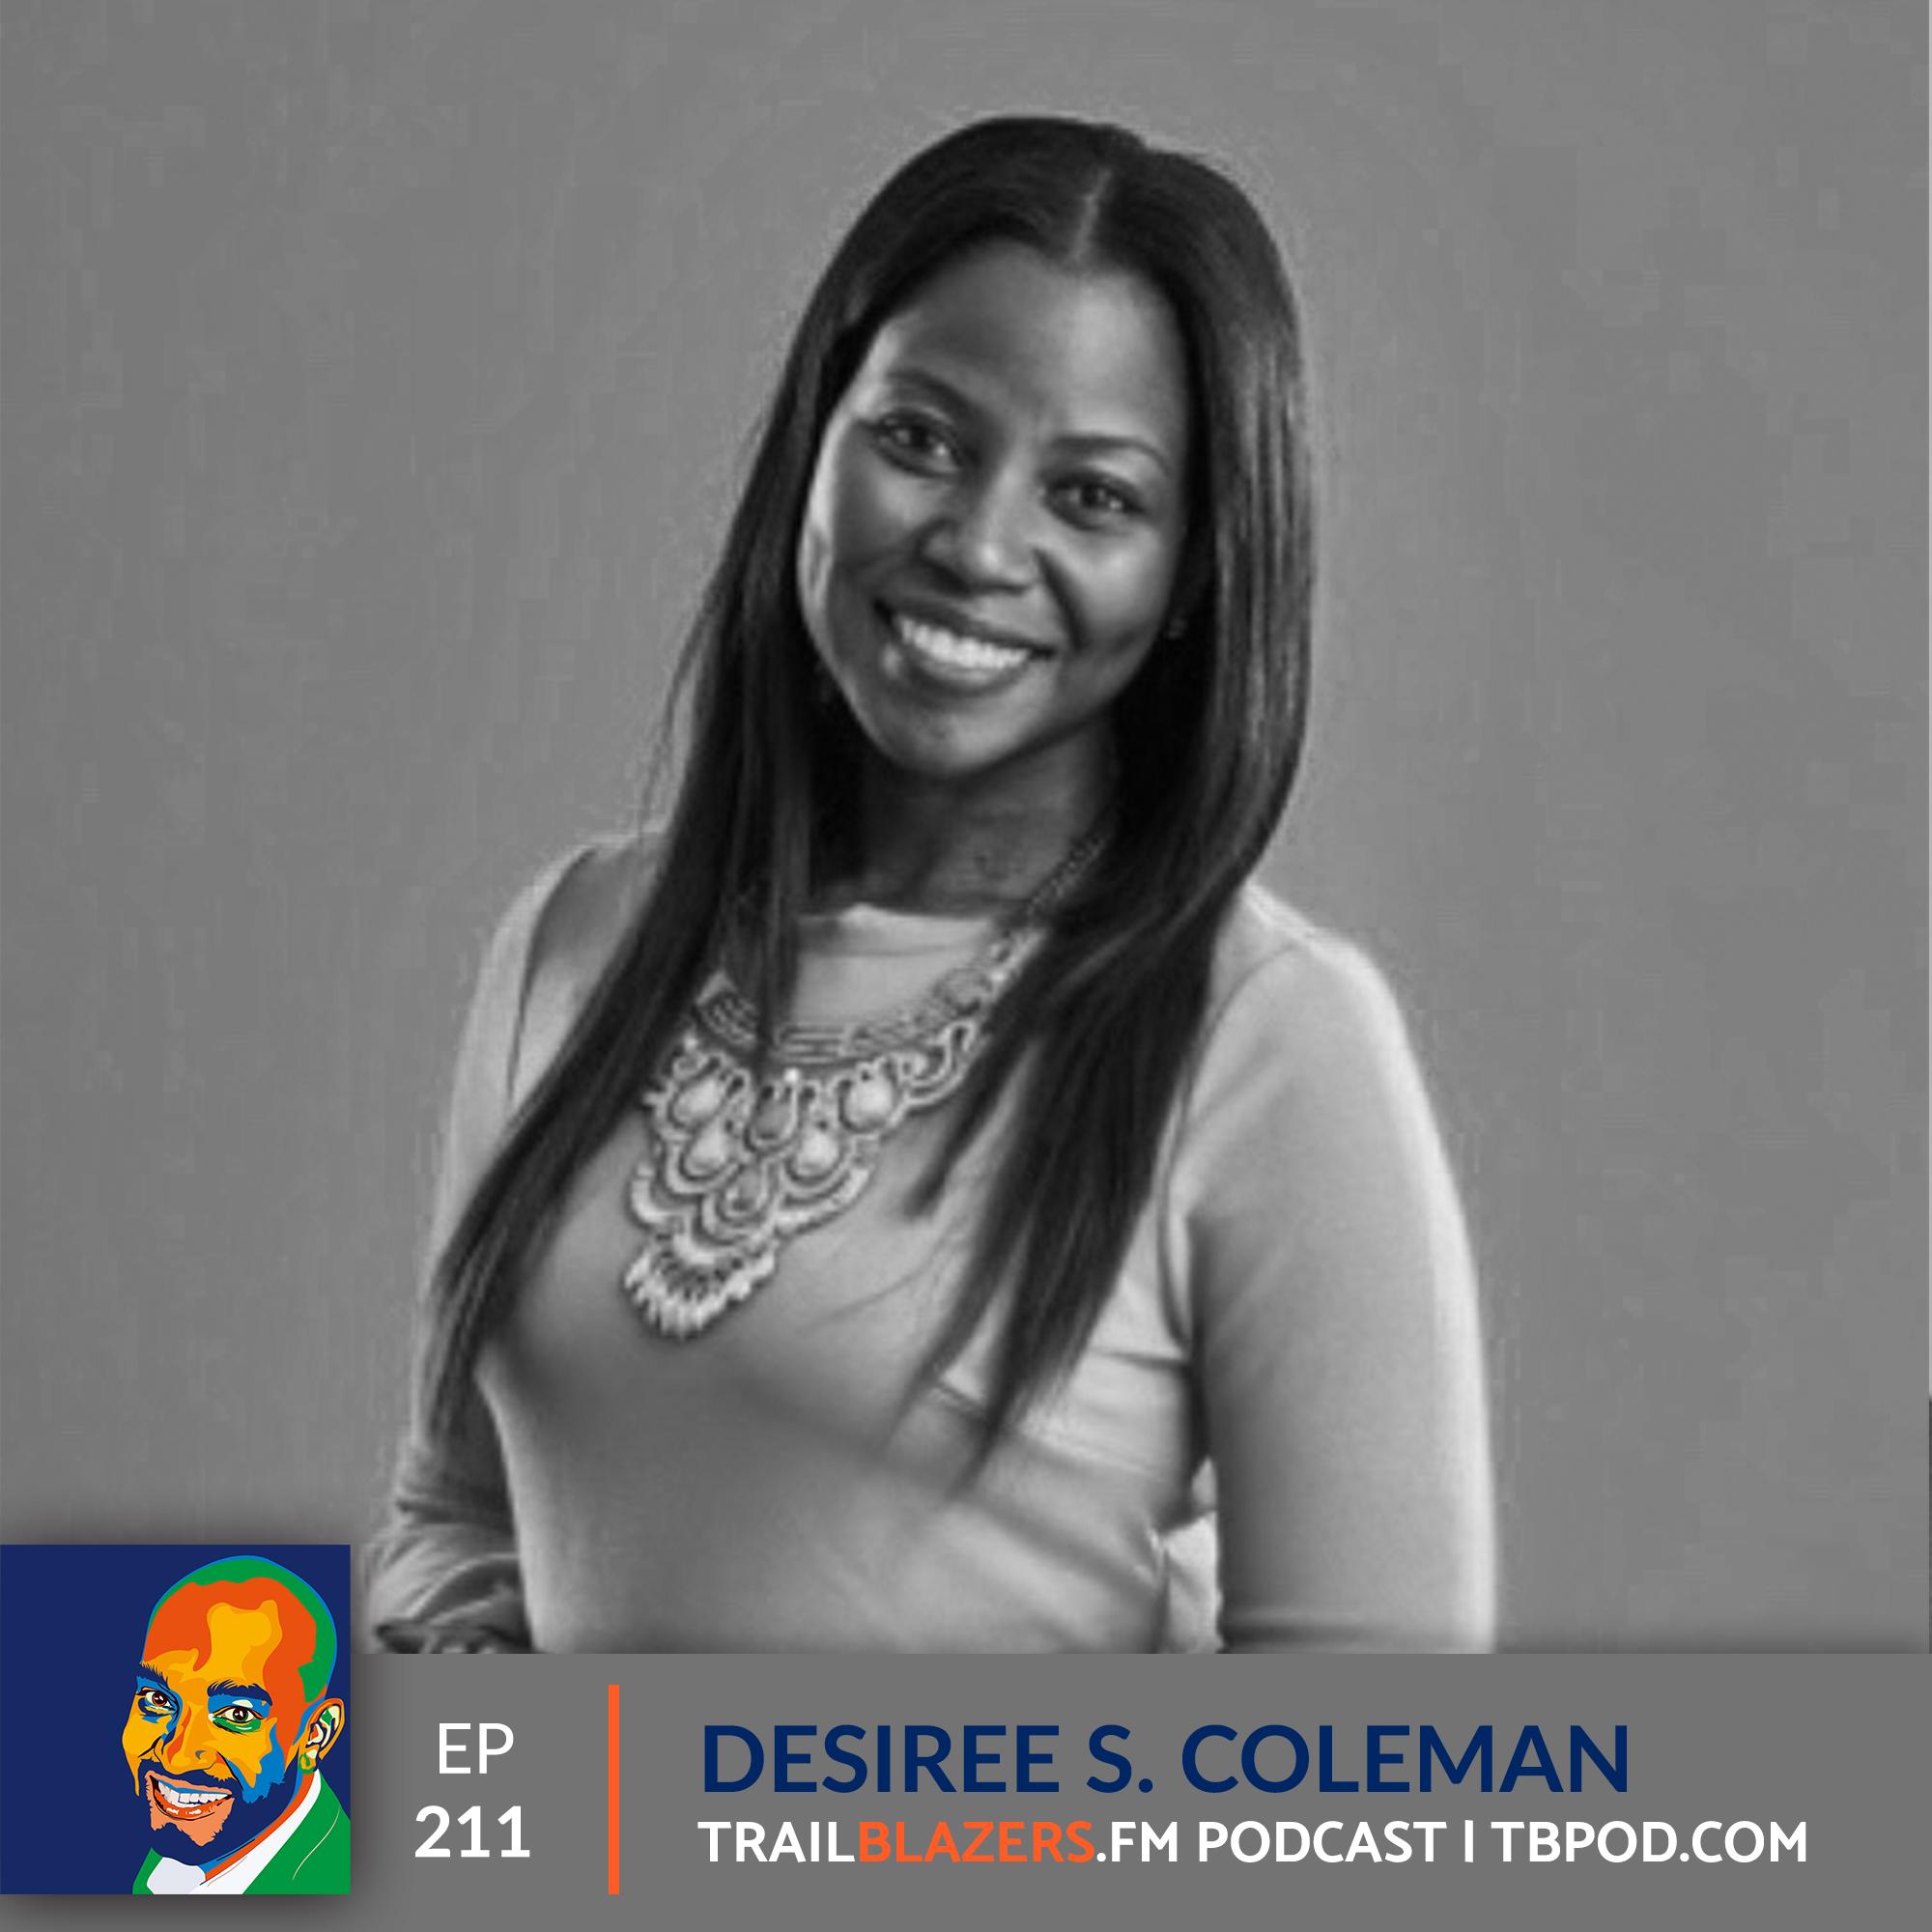 Desiree S. Coleman